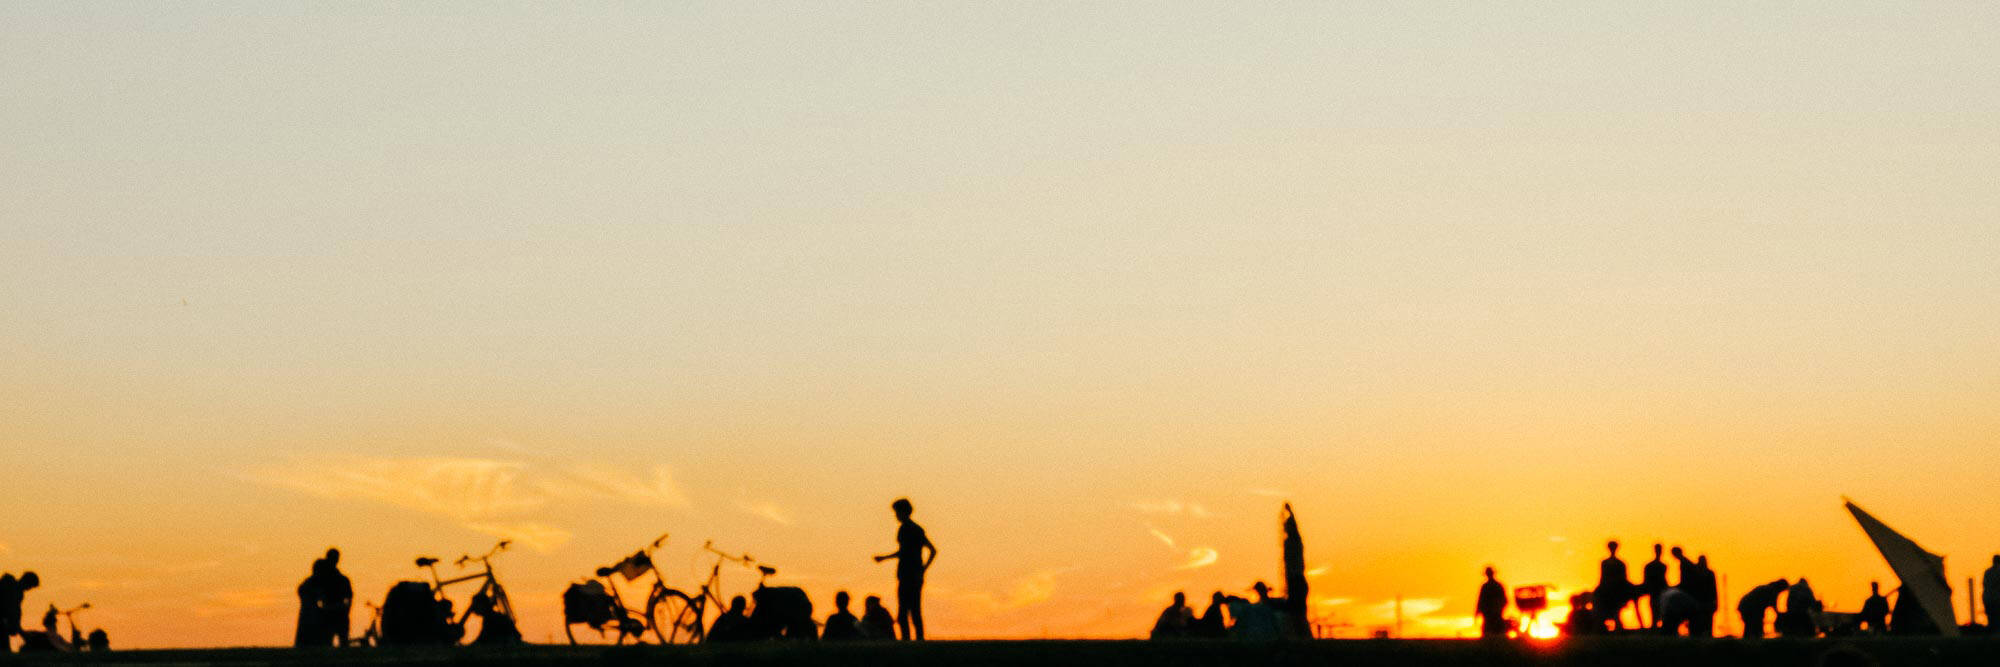 skyline-9243.jpg